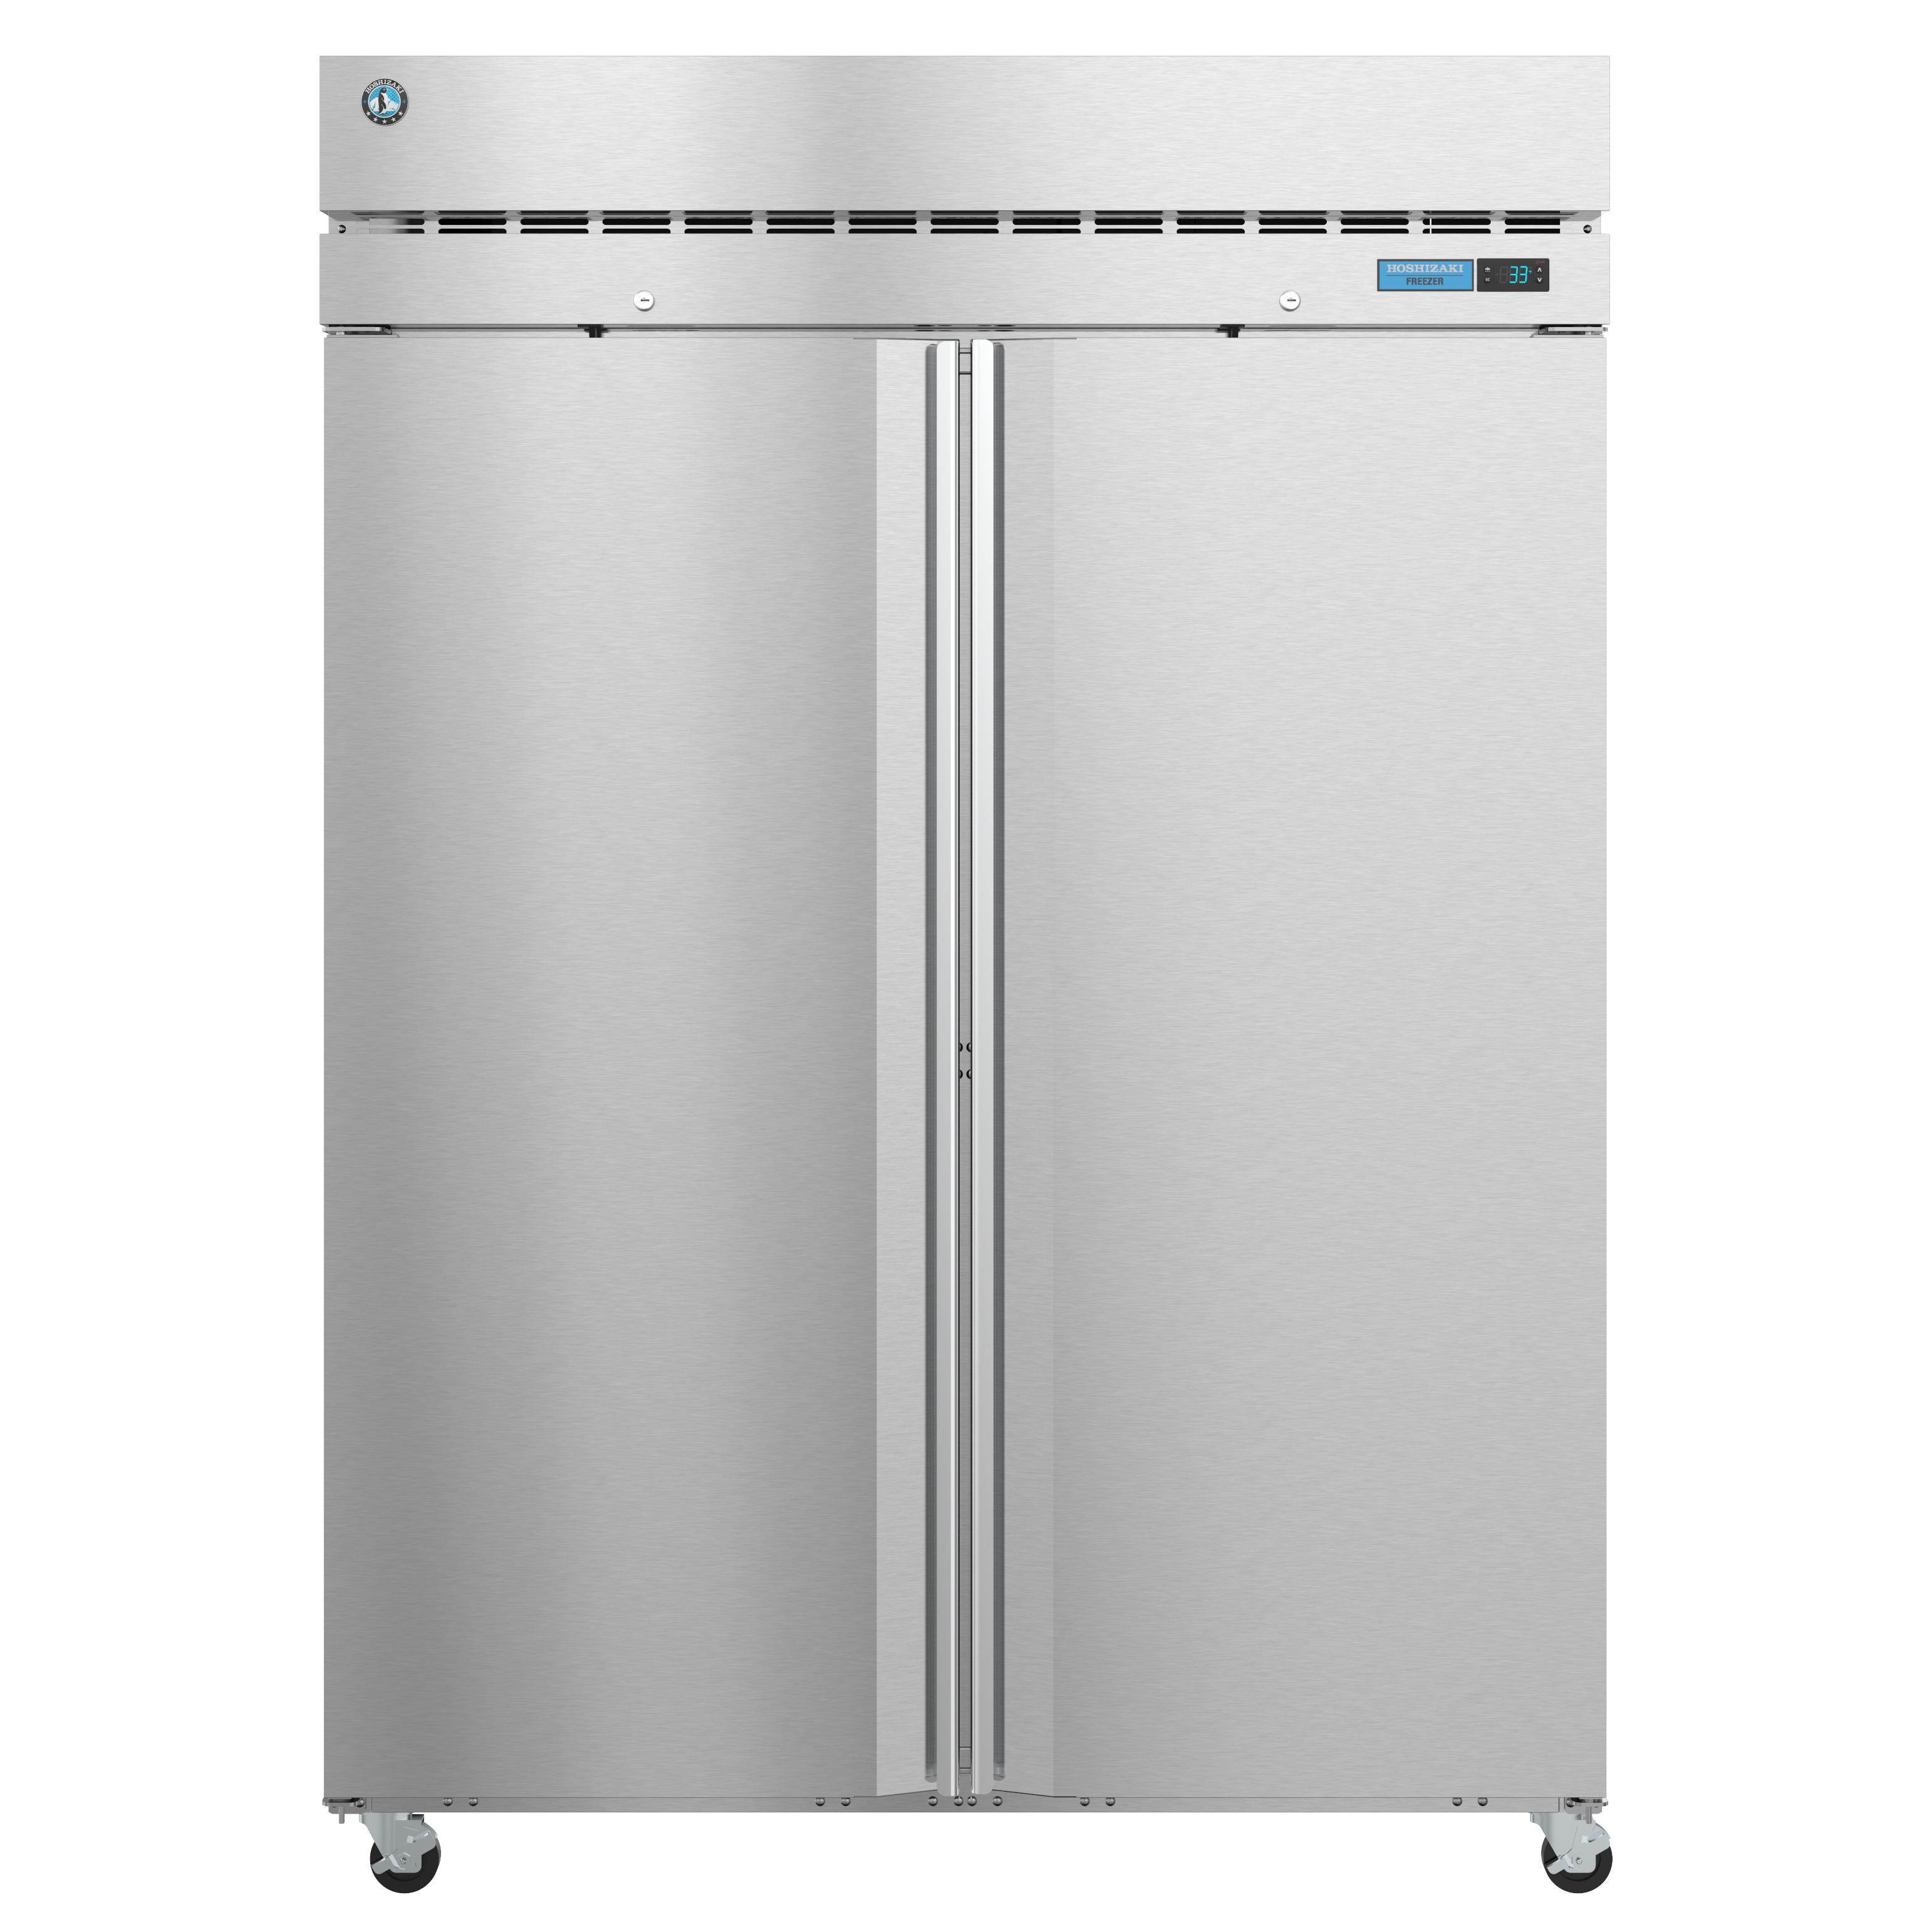 Hoshizaki F2A-FS reach-in refrigerators & freezers